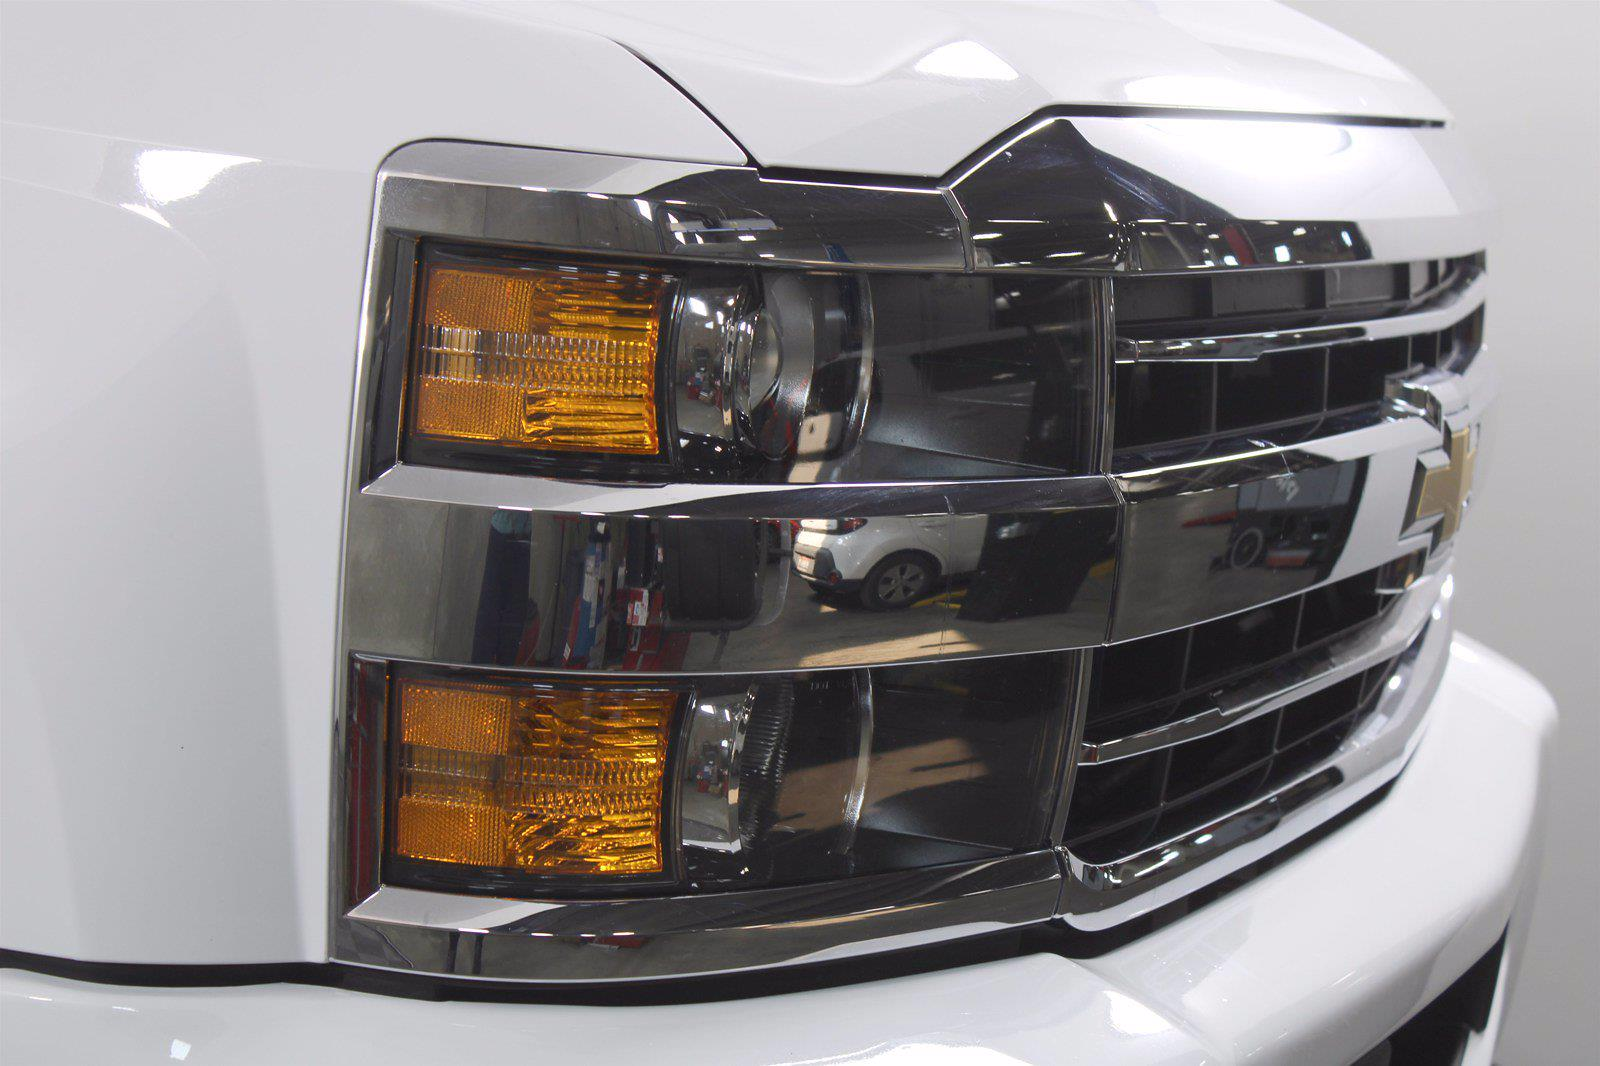 2018 Chevrolet Silverado 3500 Crew Cab 4x4, Pickup #DU90958 - photo 1